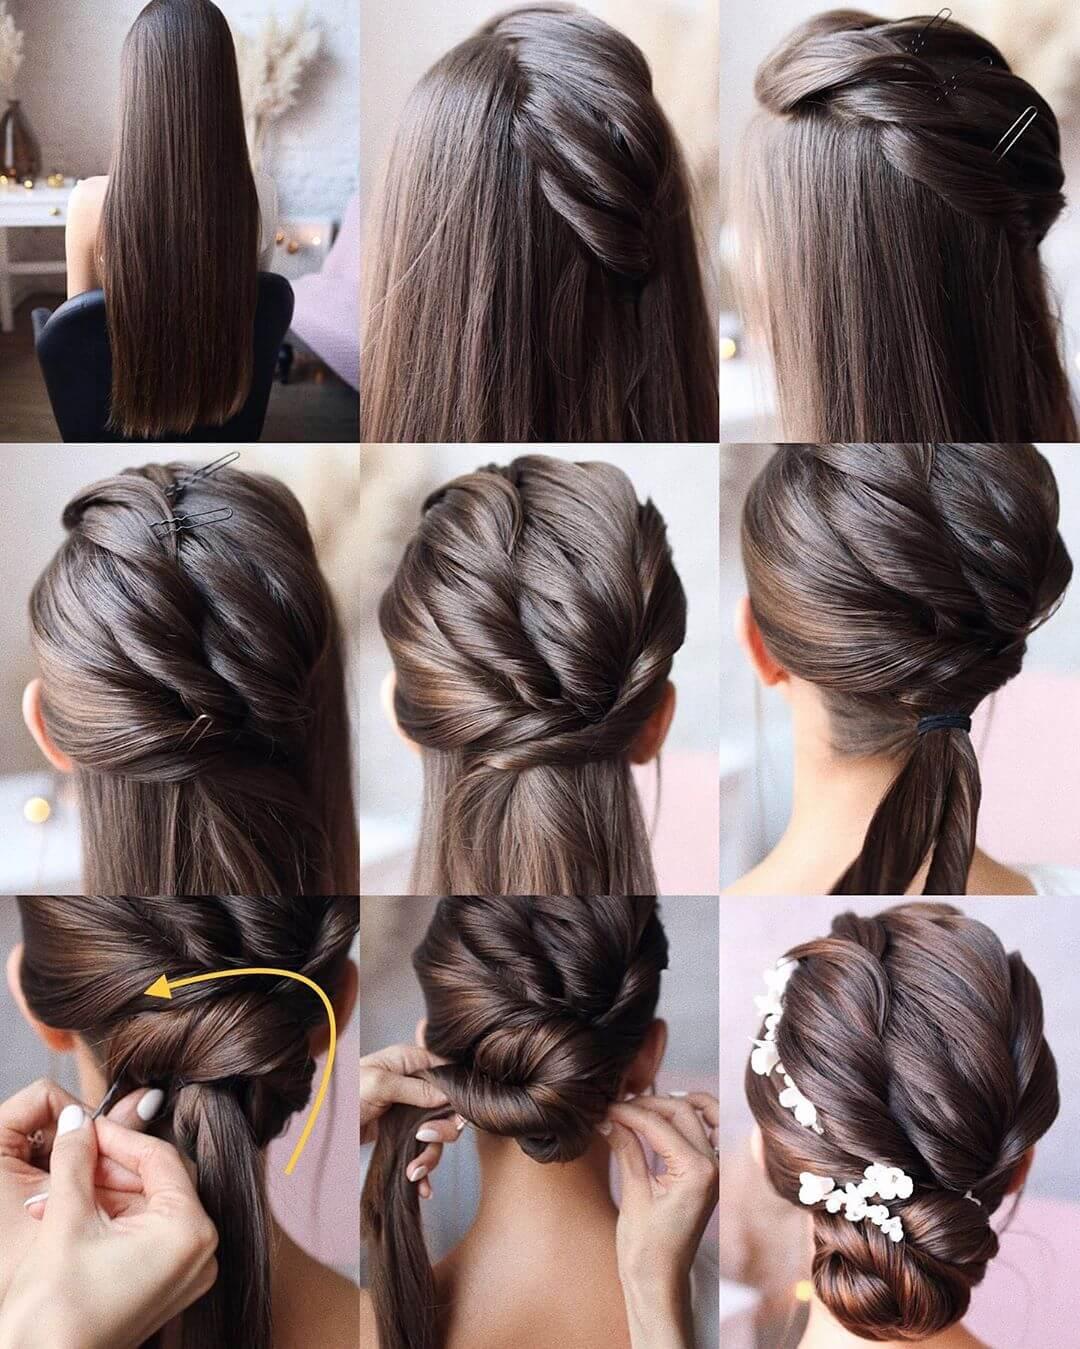 Step by Step Bridal hair bun Hairstyles for Long, Medium, Short Hair